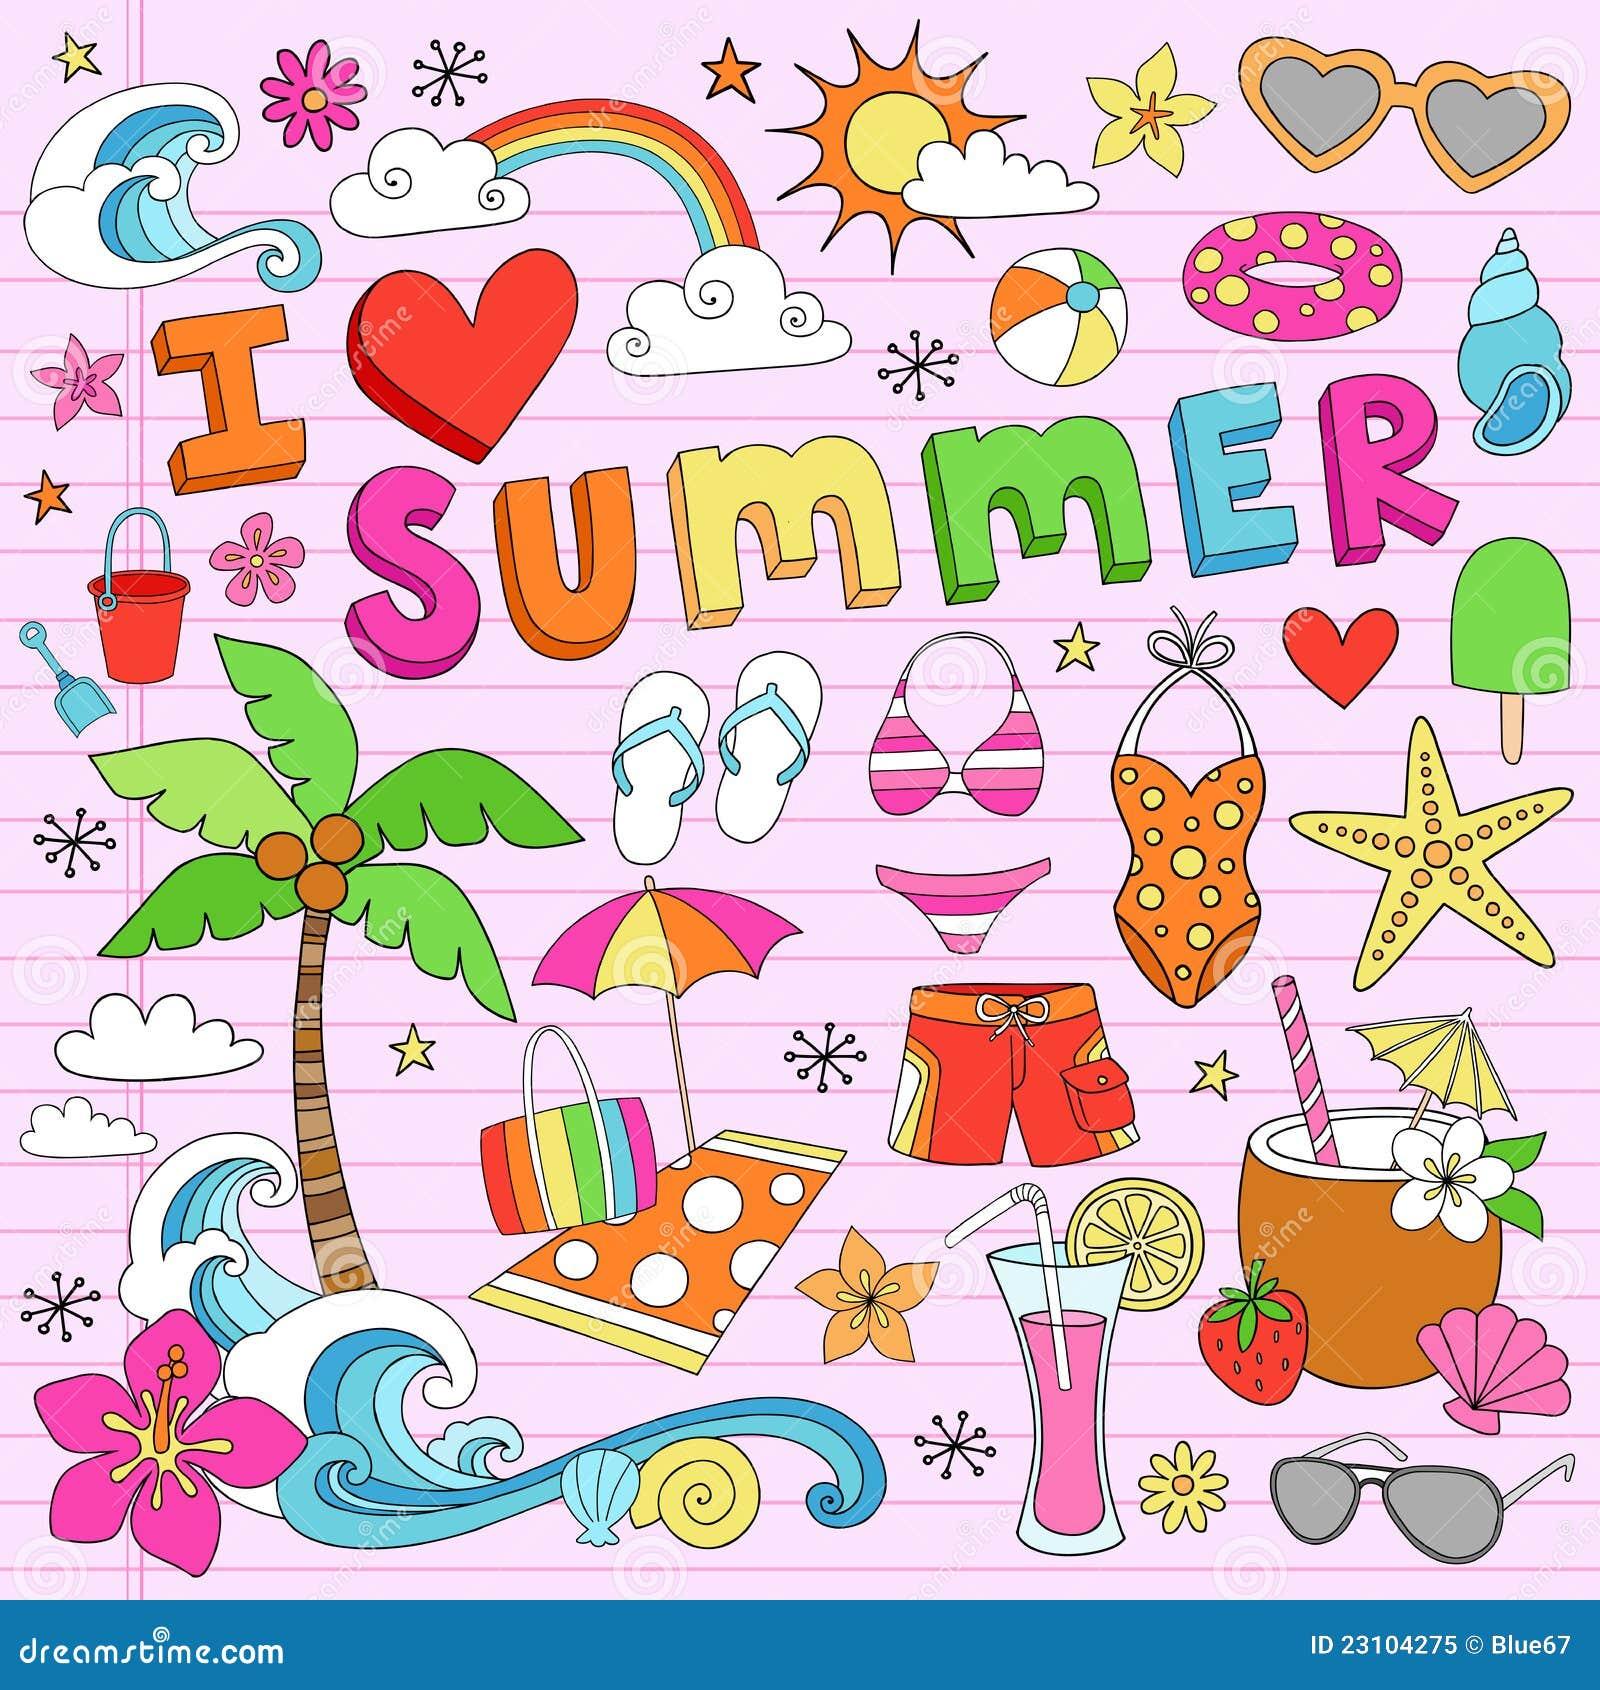 Love Summer Psychedelic Groovy Notebook Doodle Design Elements Set ...